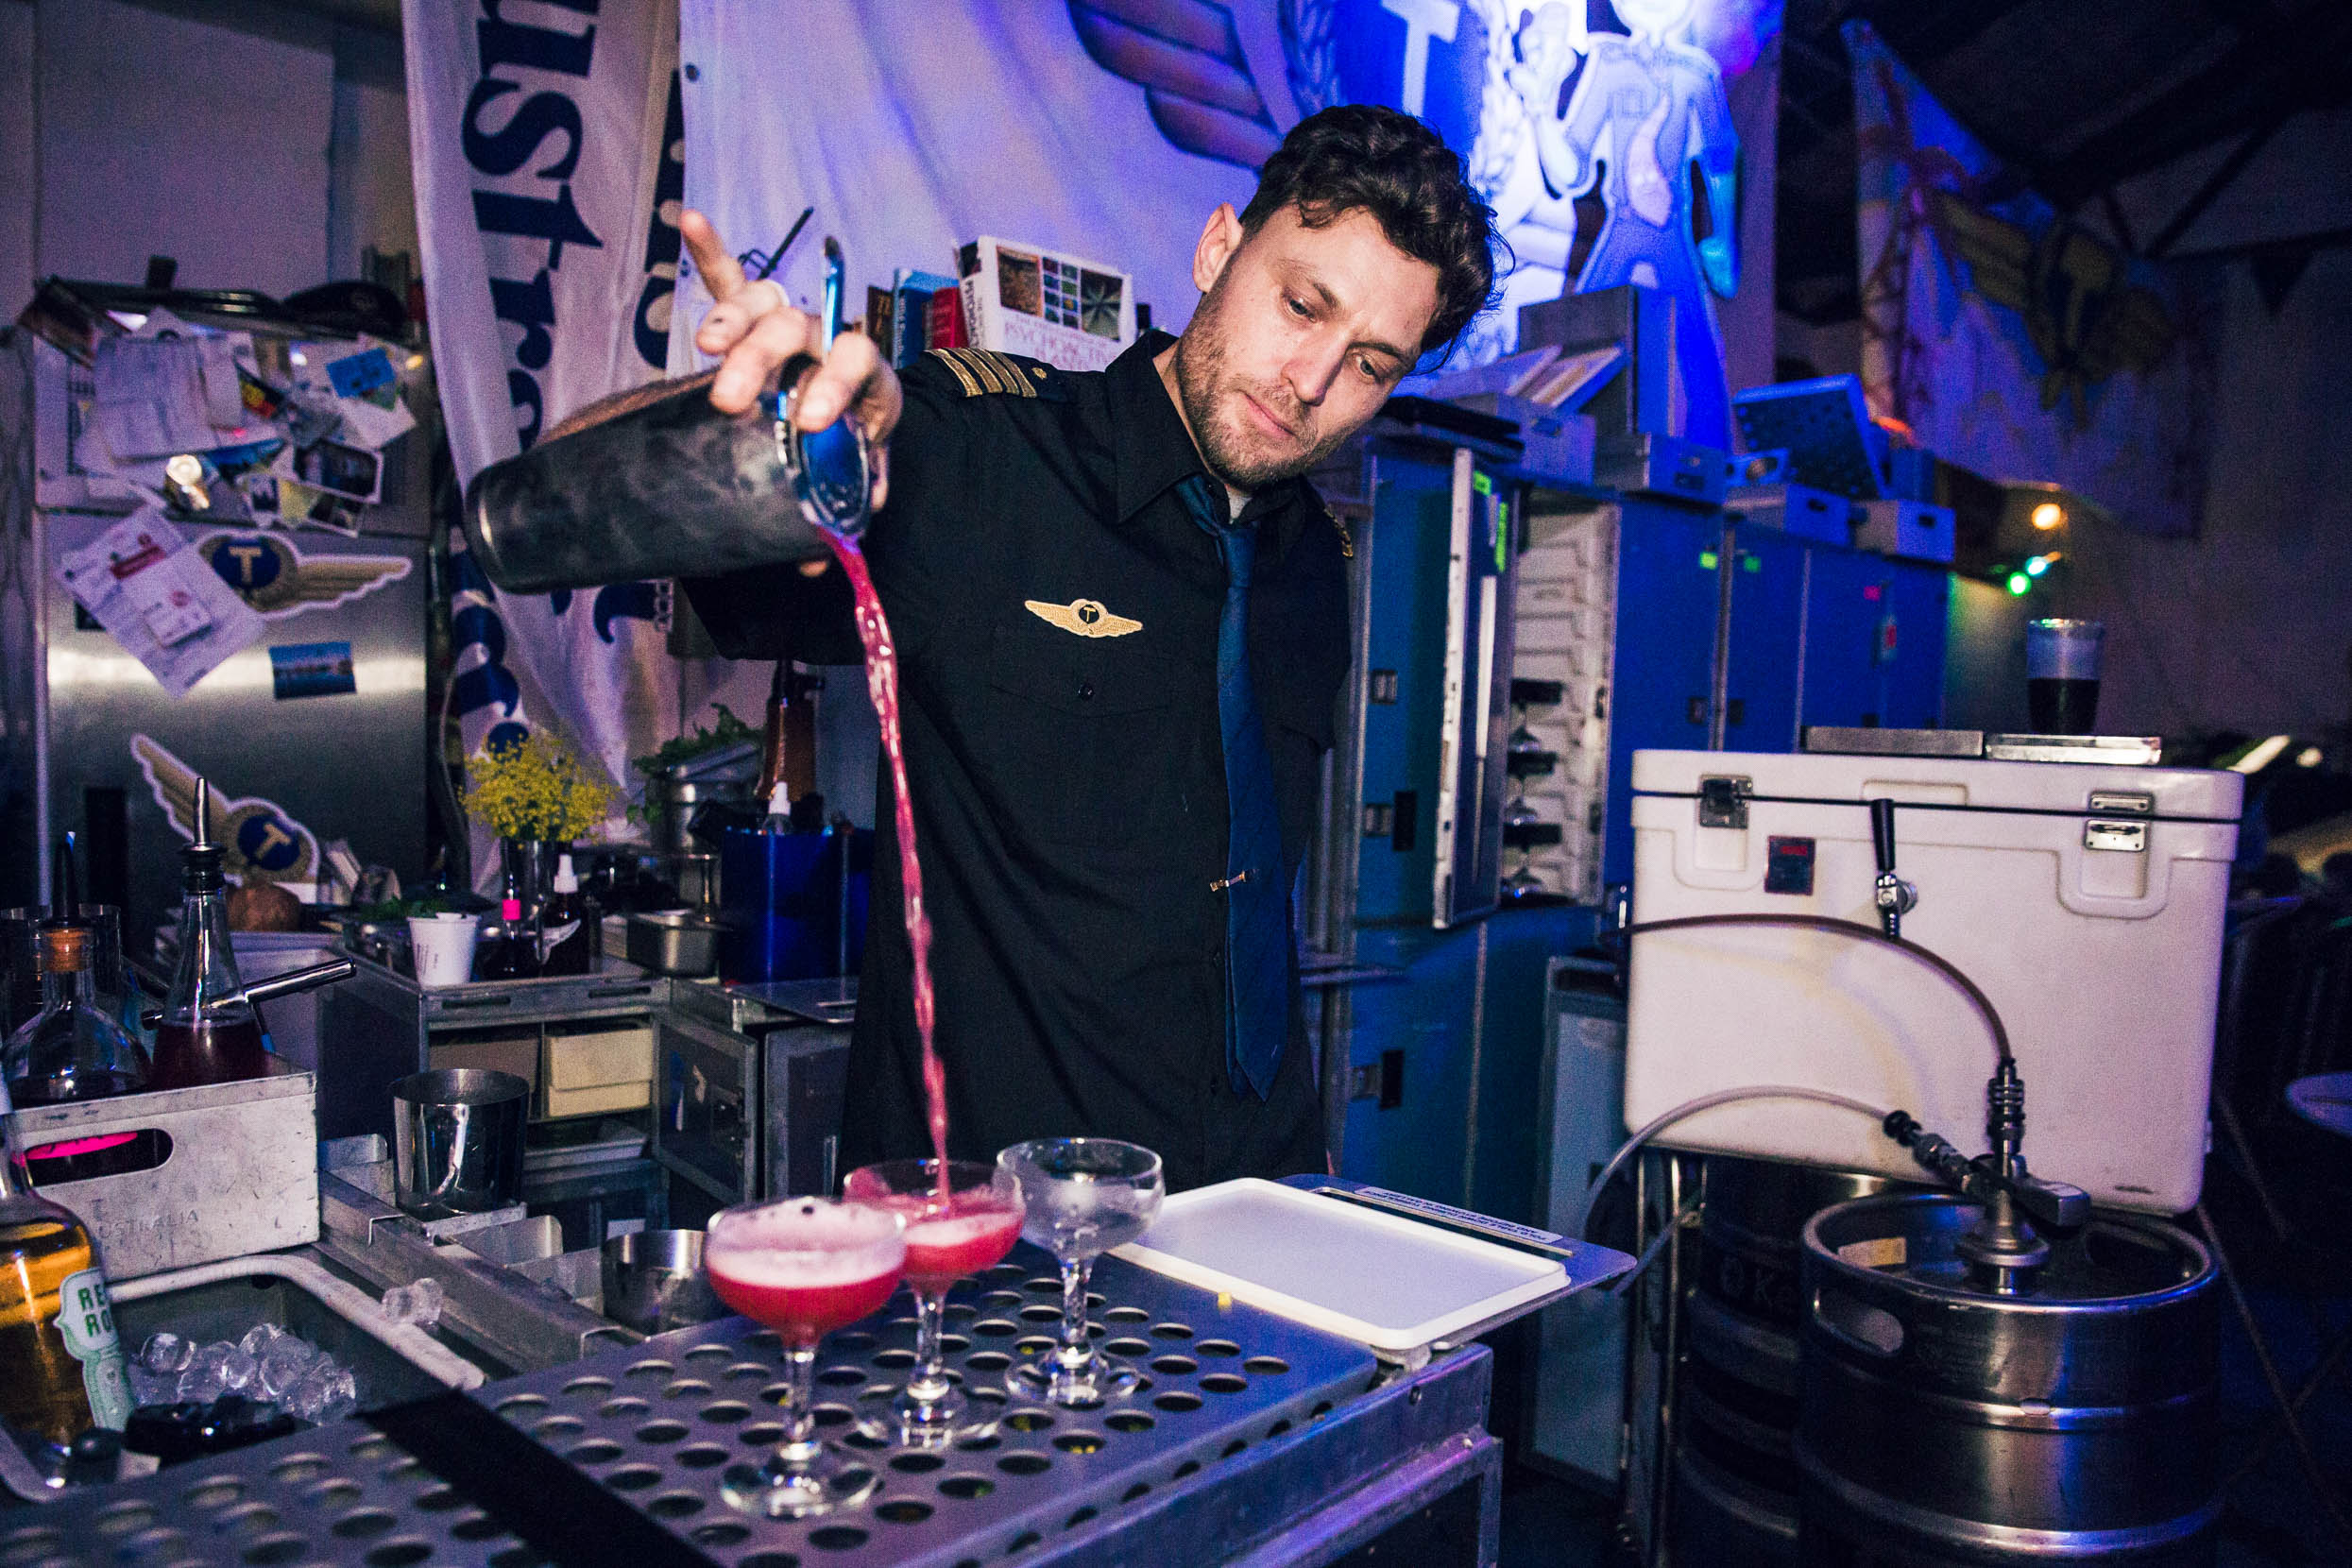 Trolley_d_ClaytonDonovan-cocktails.jpg